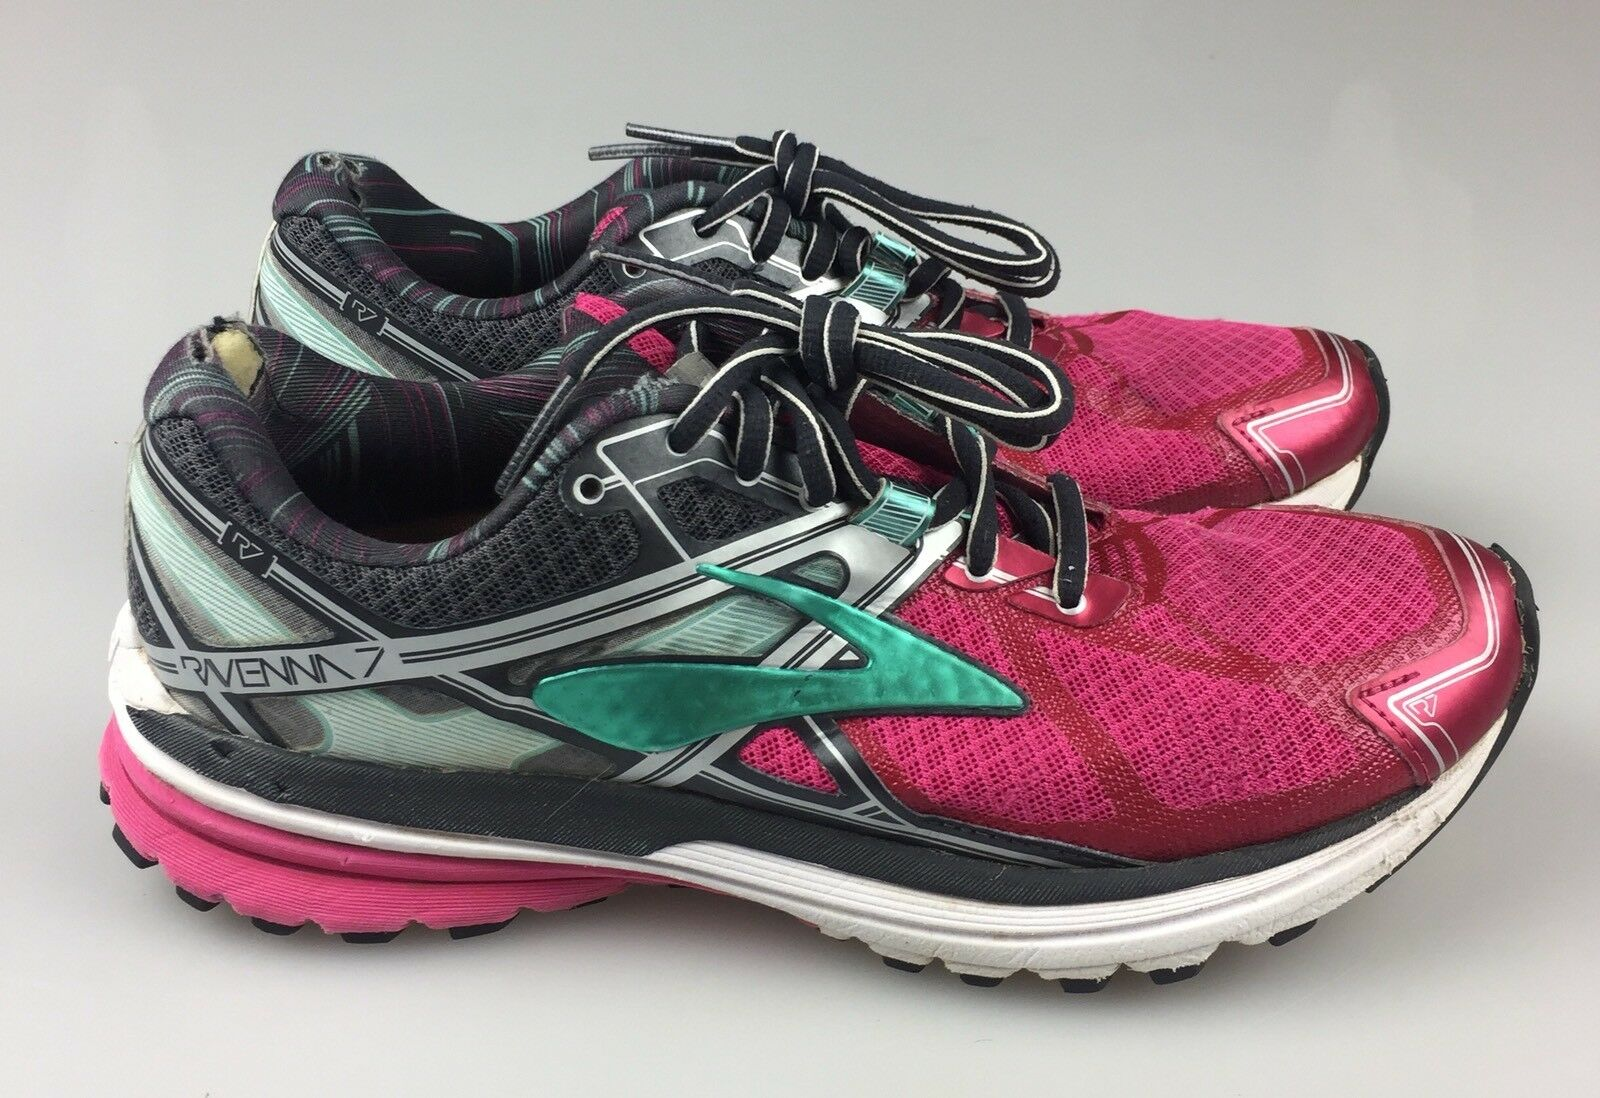 Women's Size Teal 7.5M Brooks Ravenna 7 Running Shoe Gray Teal Size Pink Superfeet Insoles 289cfd